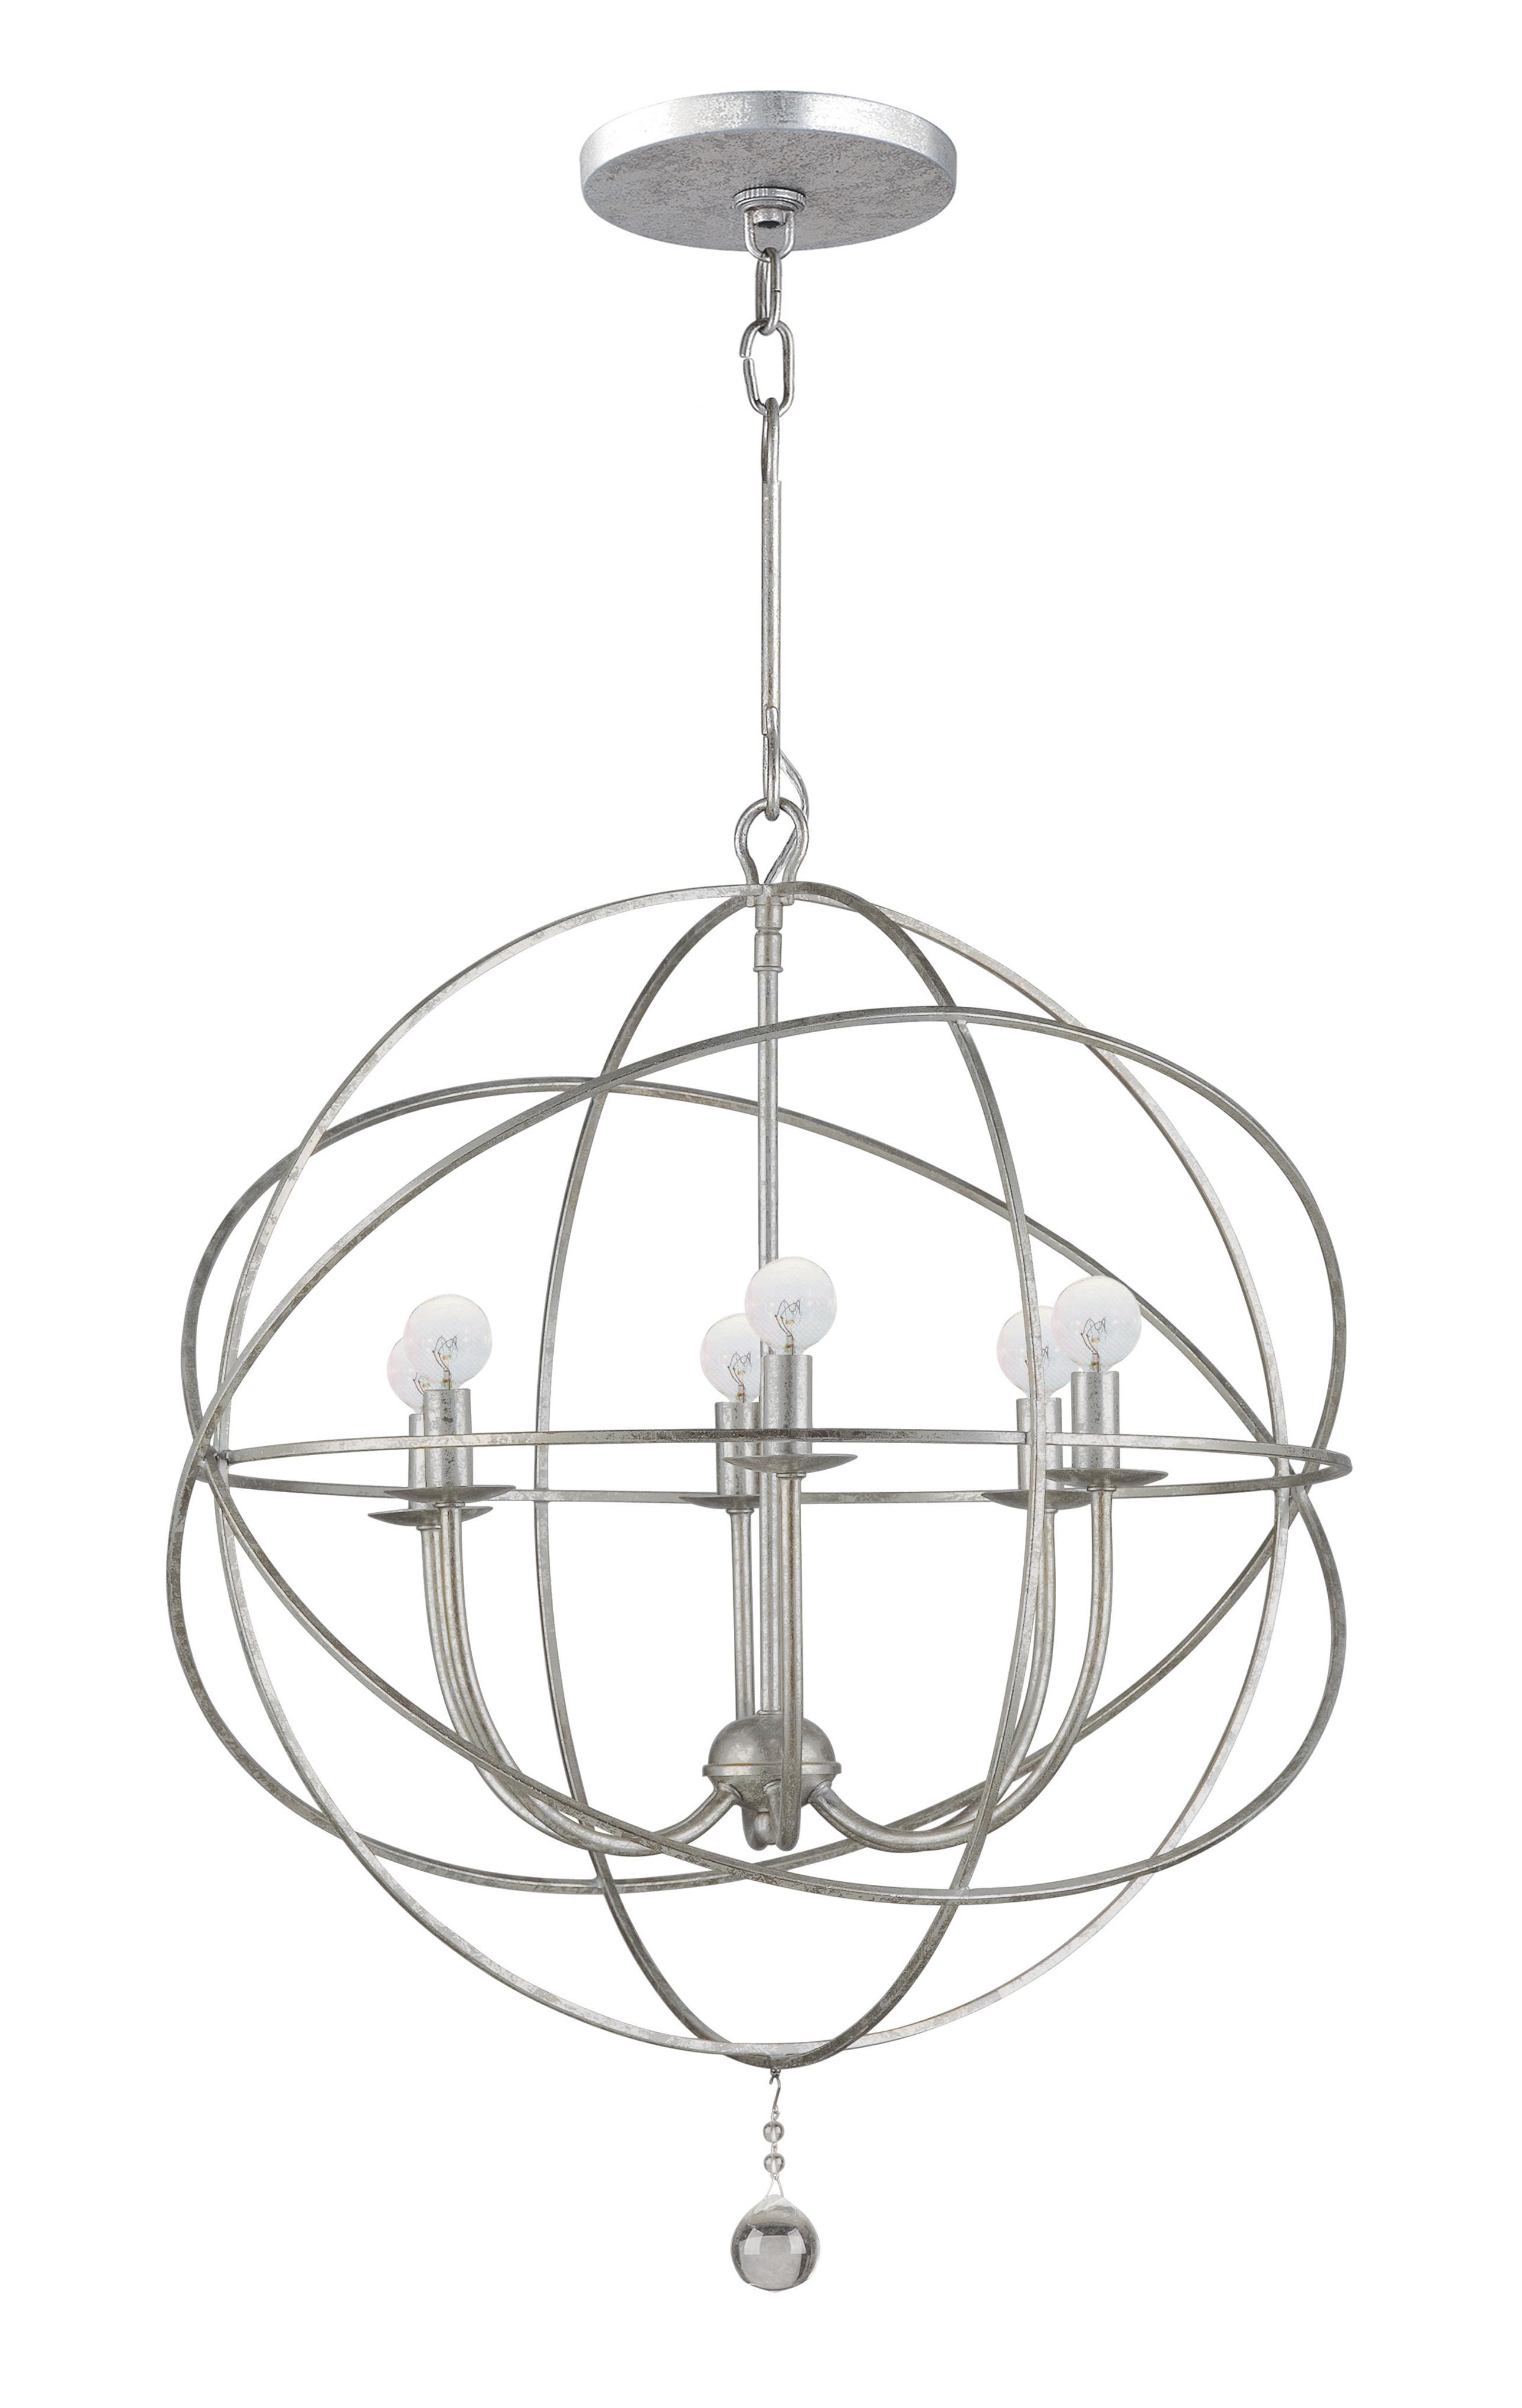 Gregoire 6 Light Globe Chandelier In Popular Alden 6 Light Globe Chandeliers (View 14 of 25)